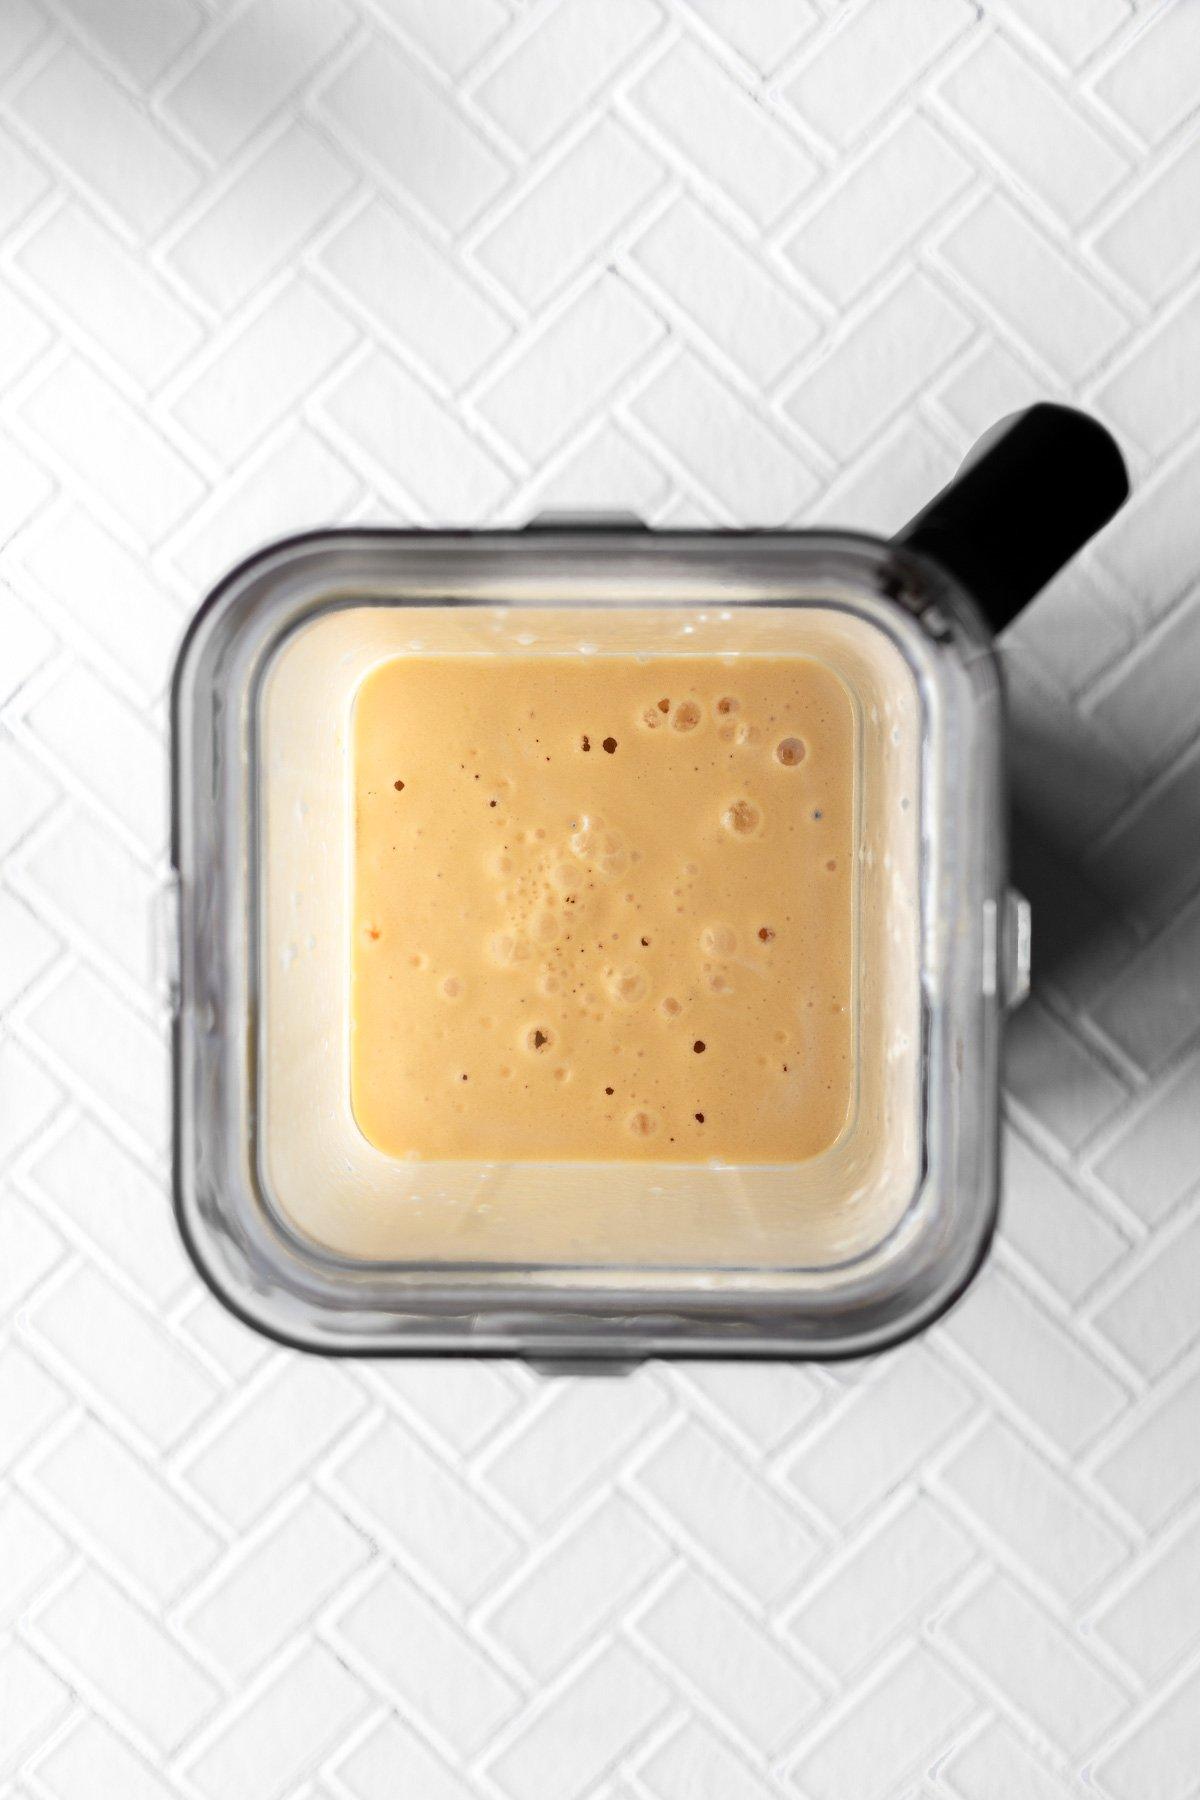 blender jar with blended peach jello salad inside